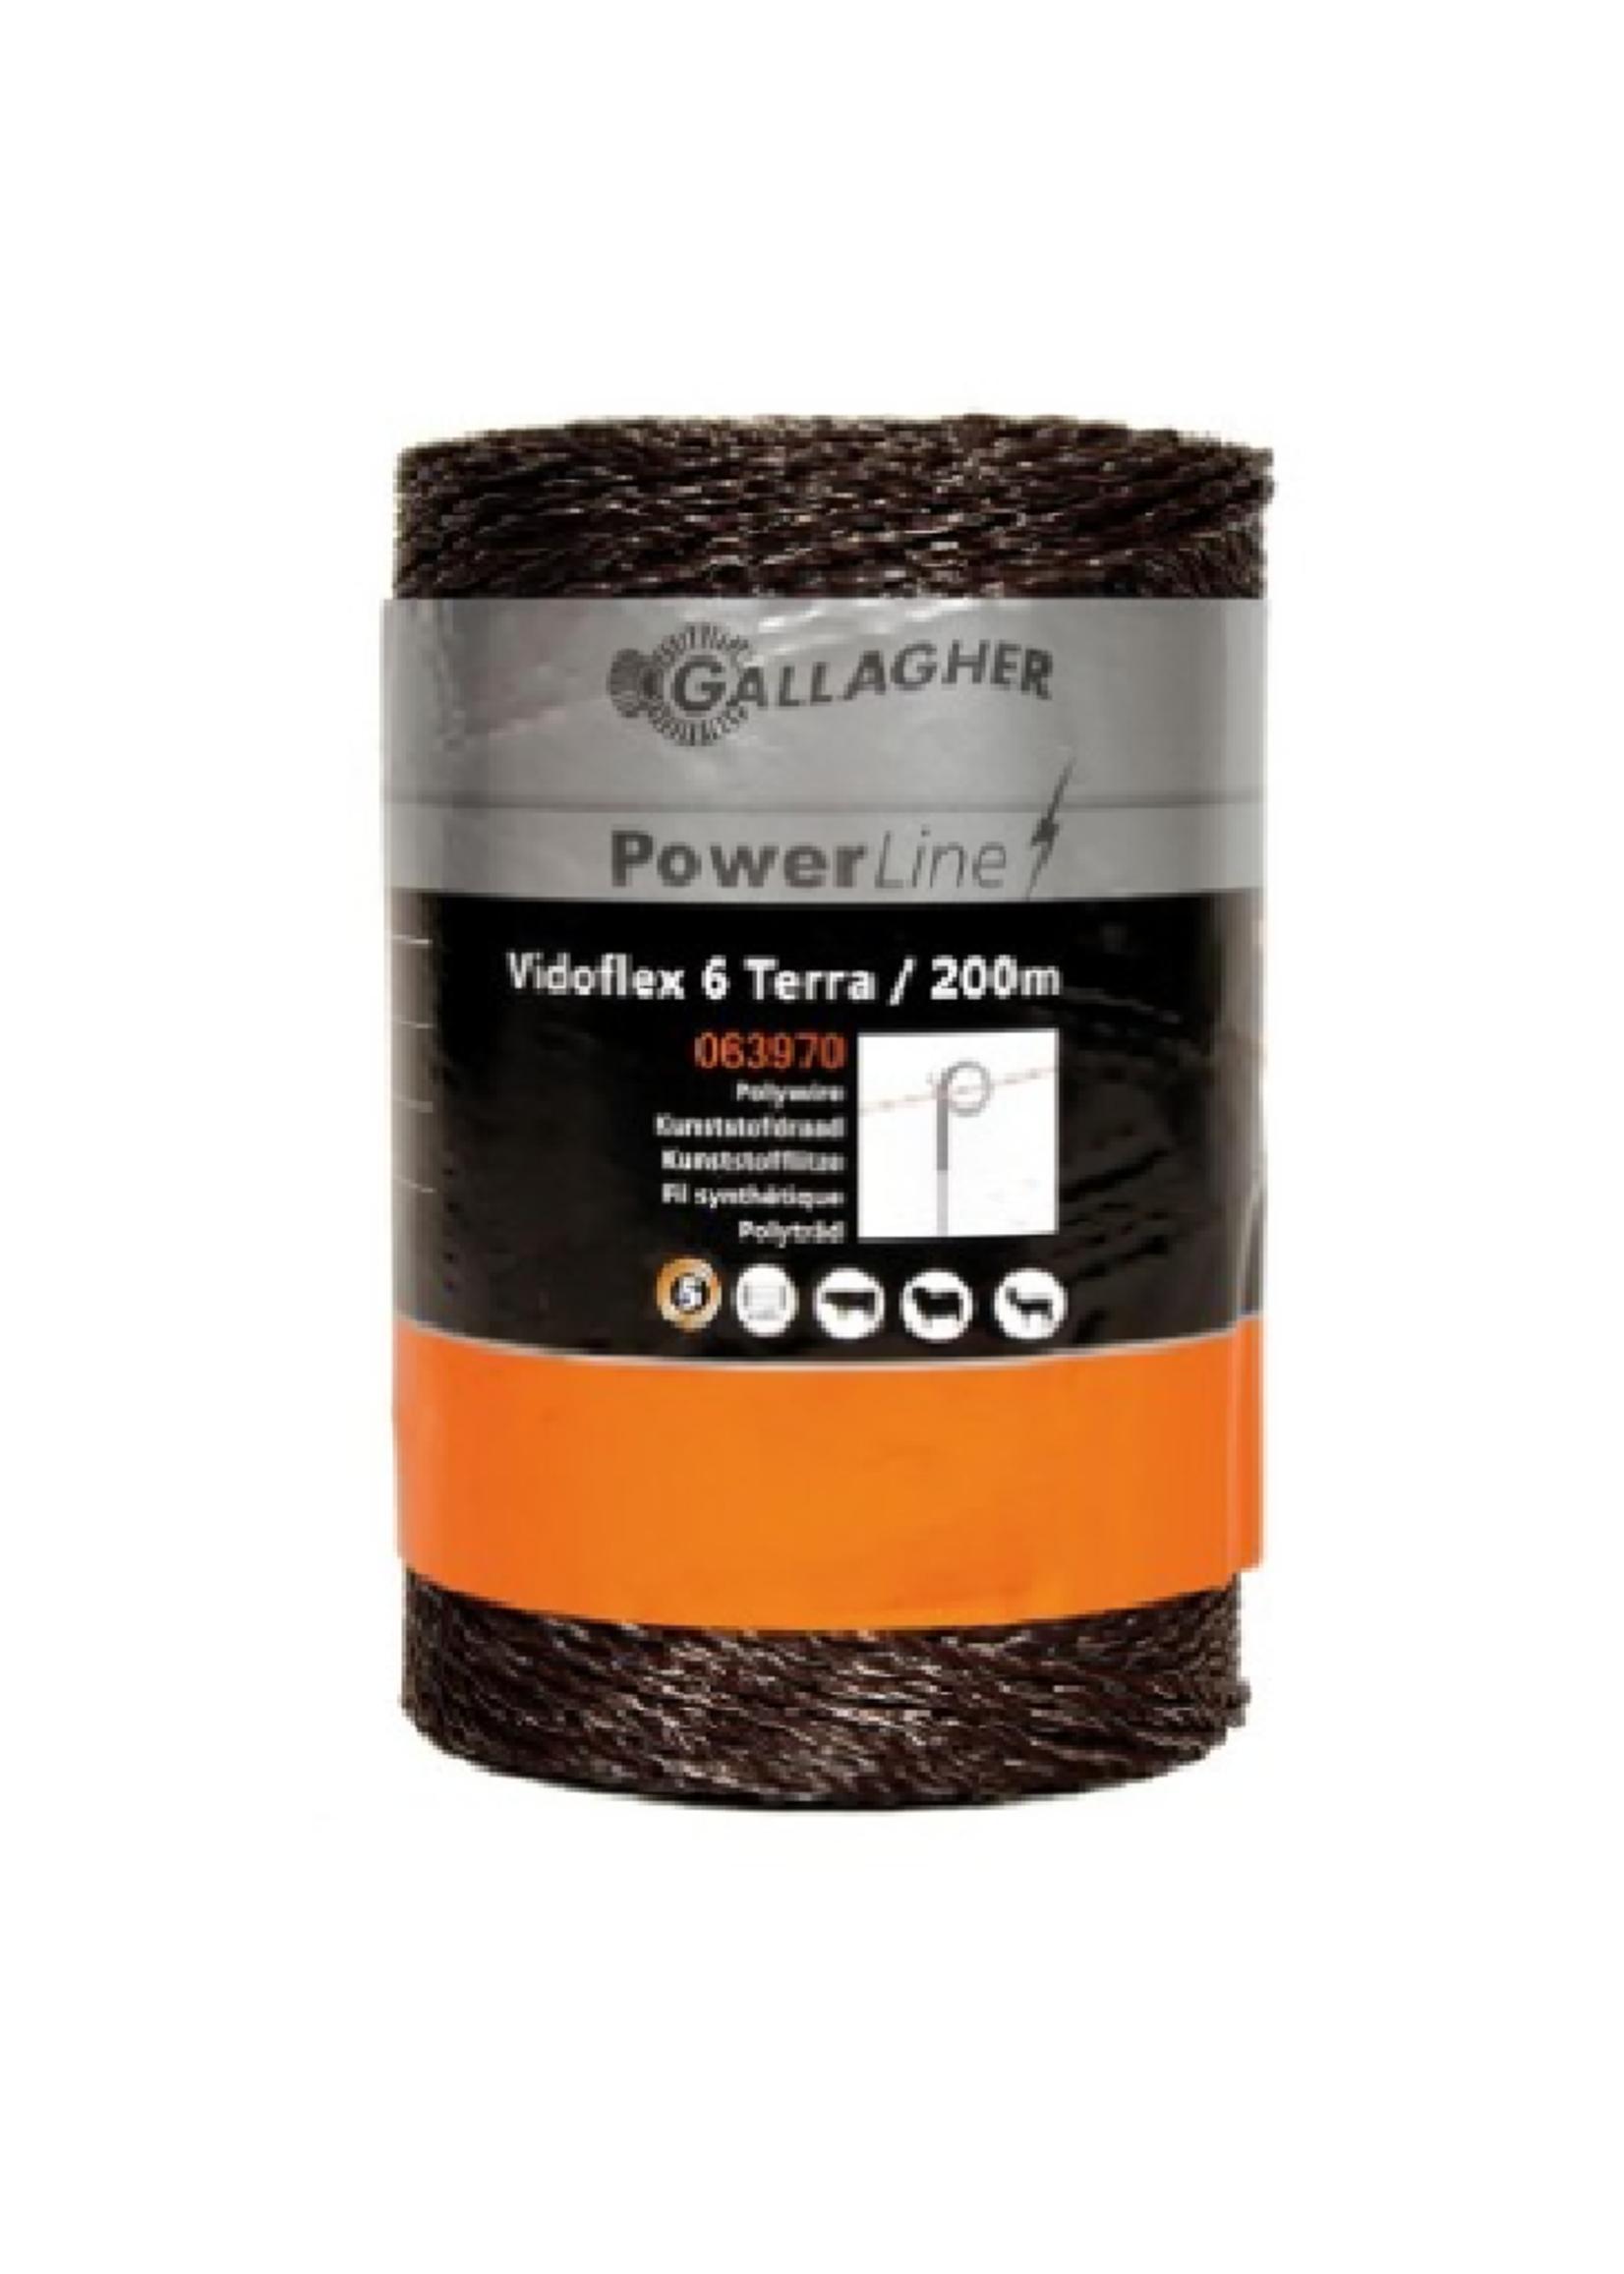 Gallagher Gallagher vidoflex 6 (kunststofdraad) 200m terra